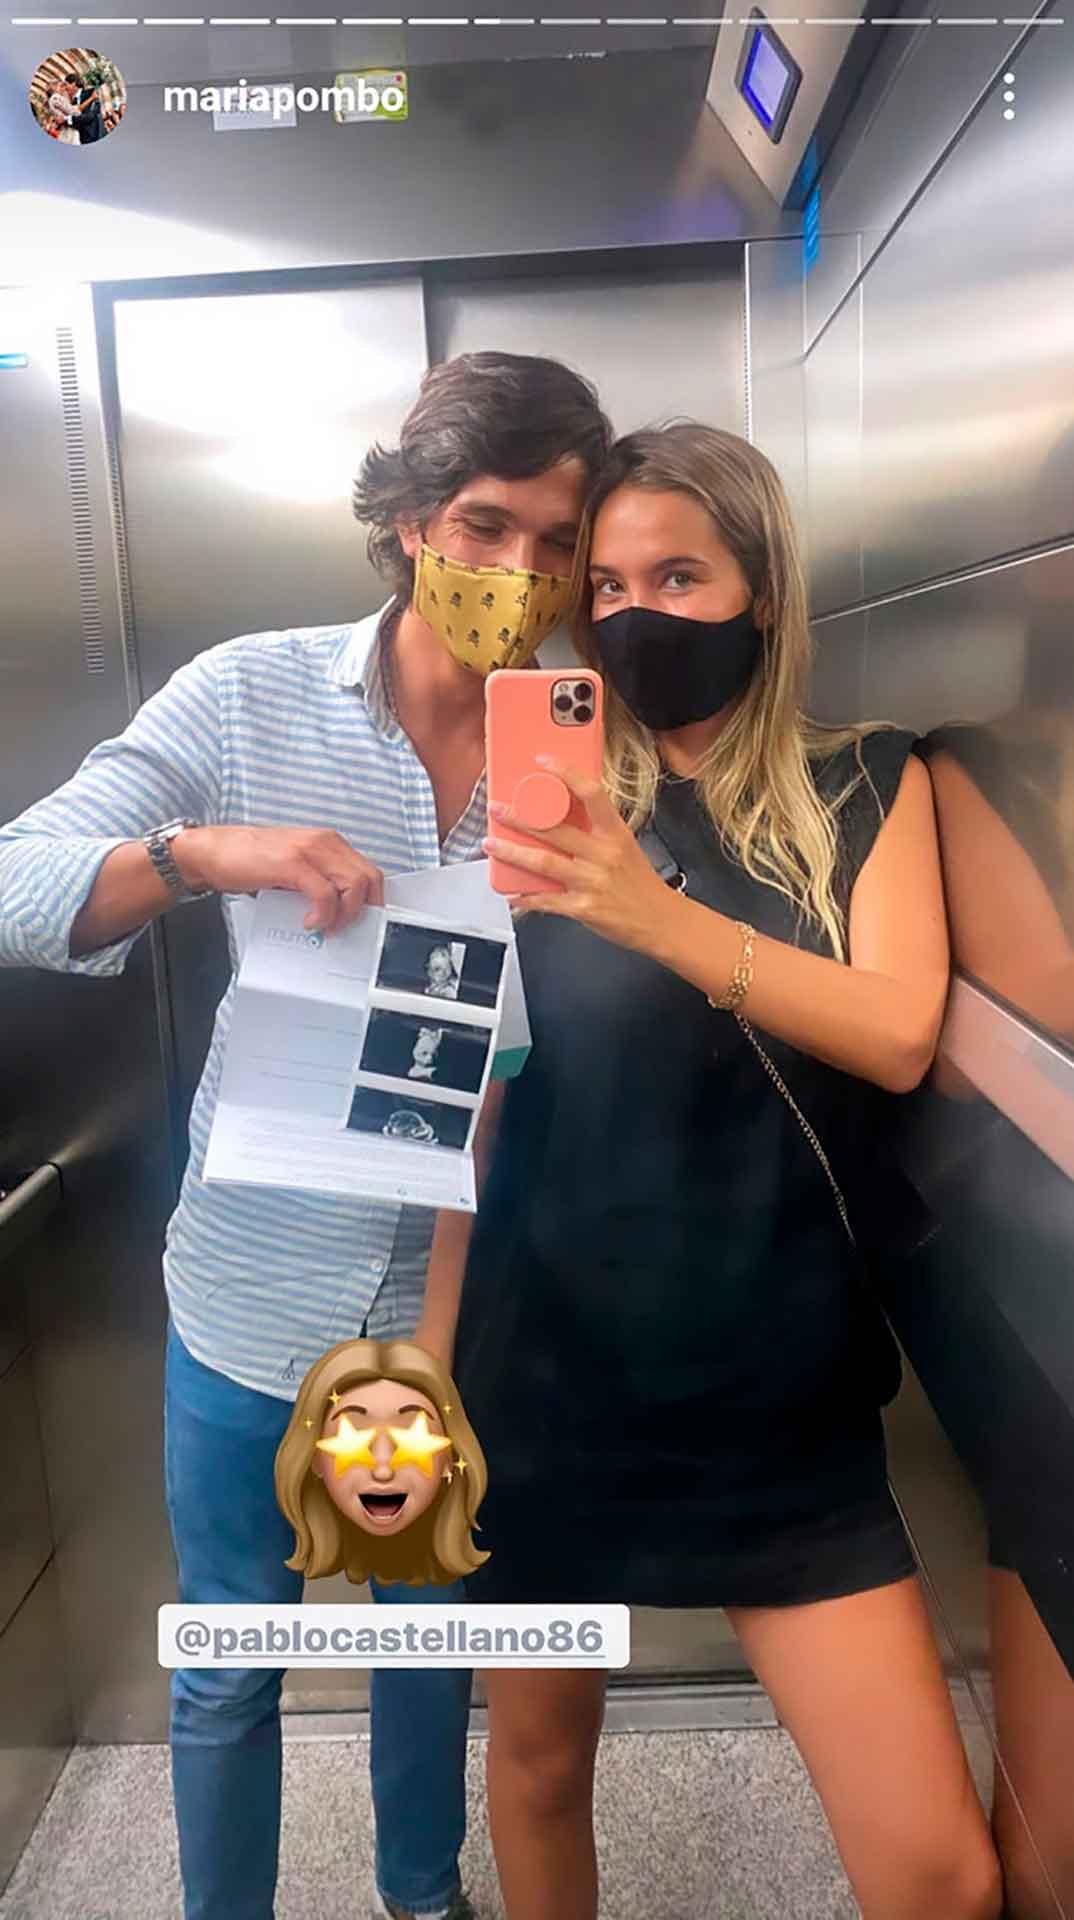 Maria Pombo y Pablo Castellano © Instagram